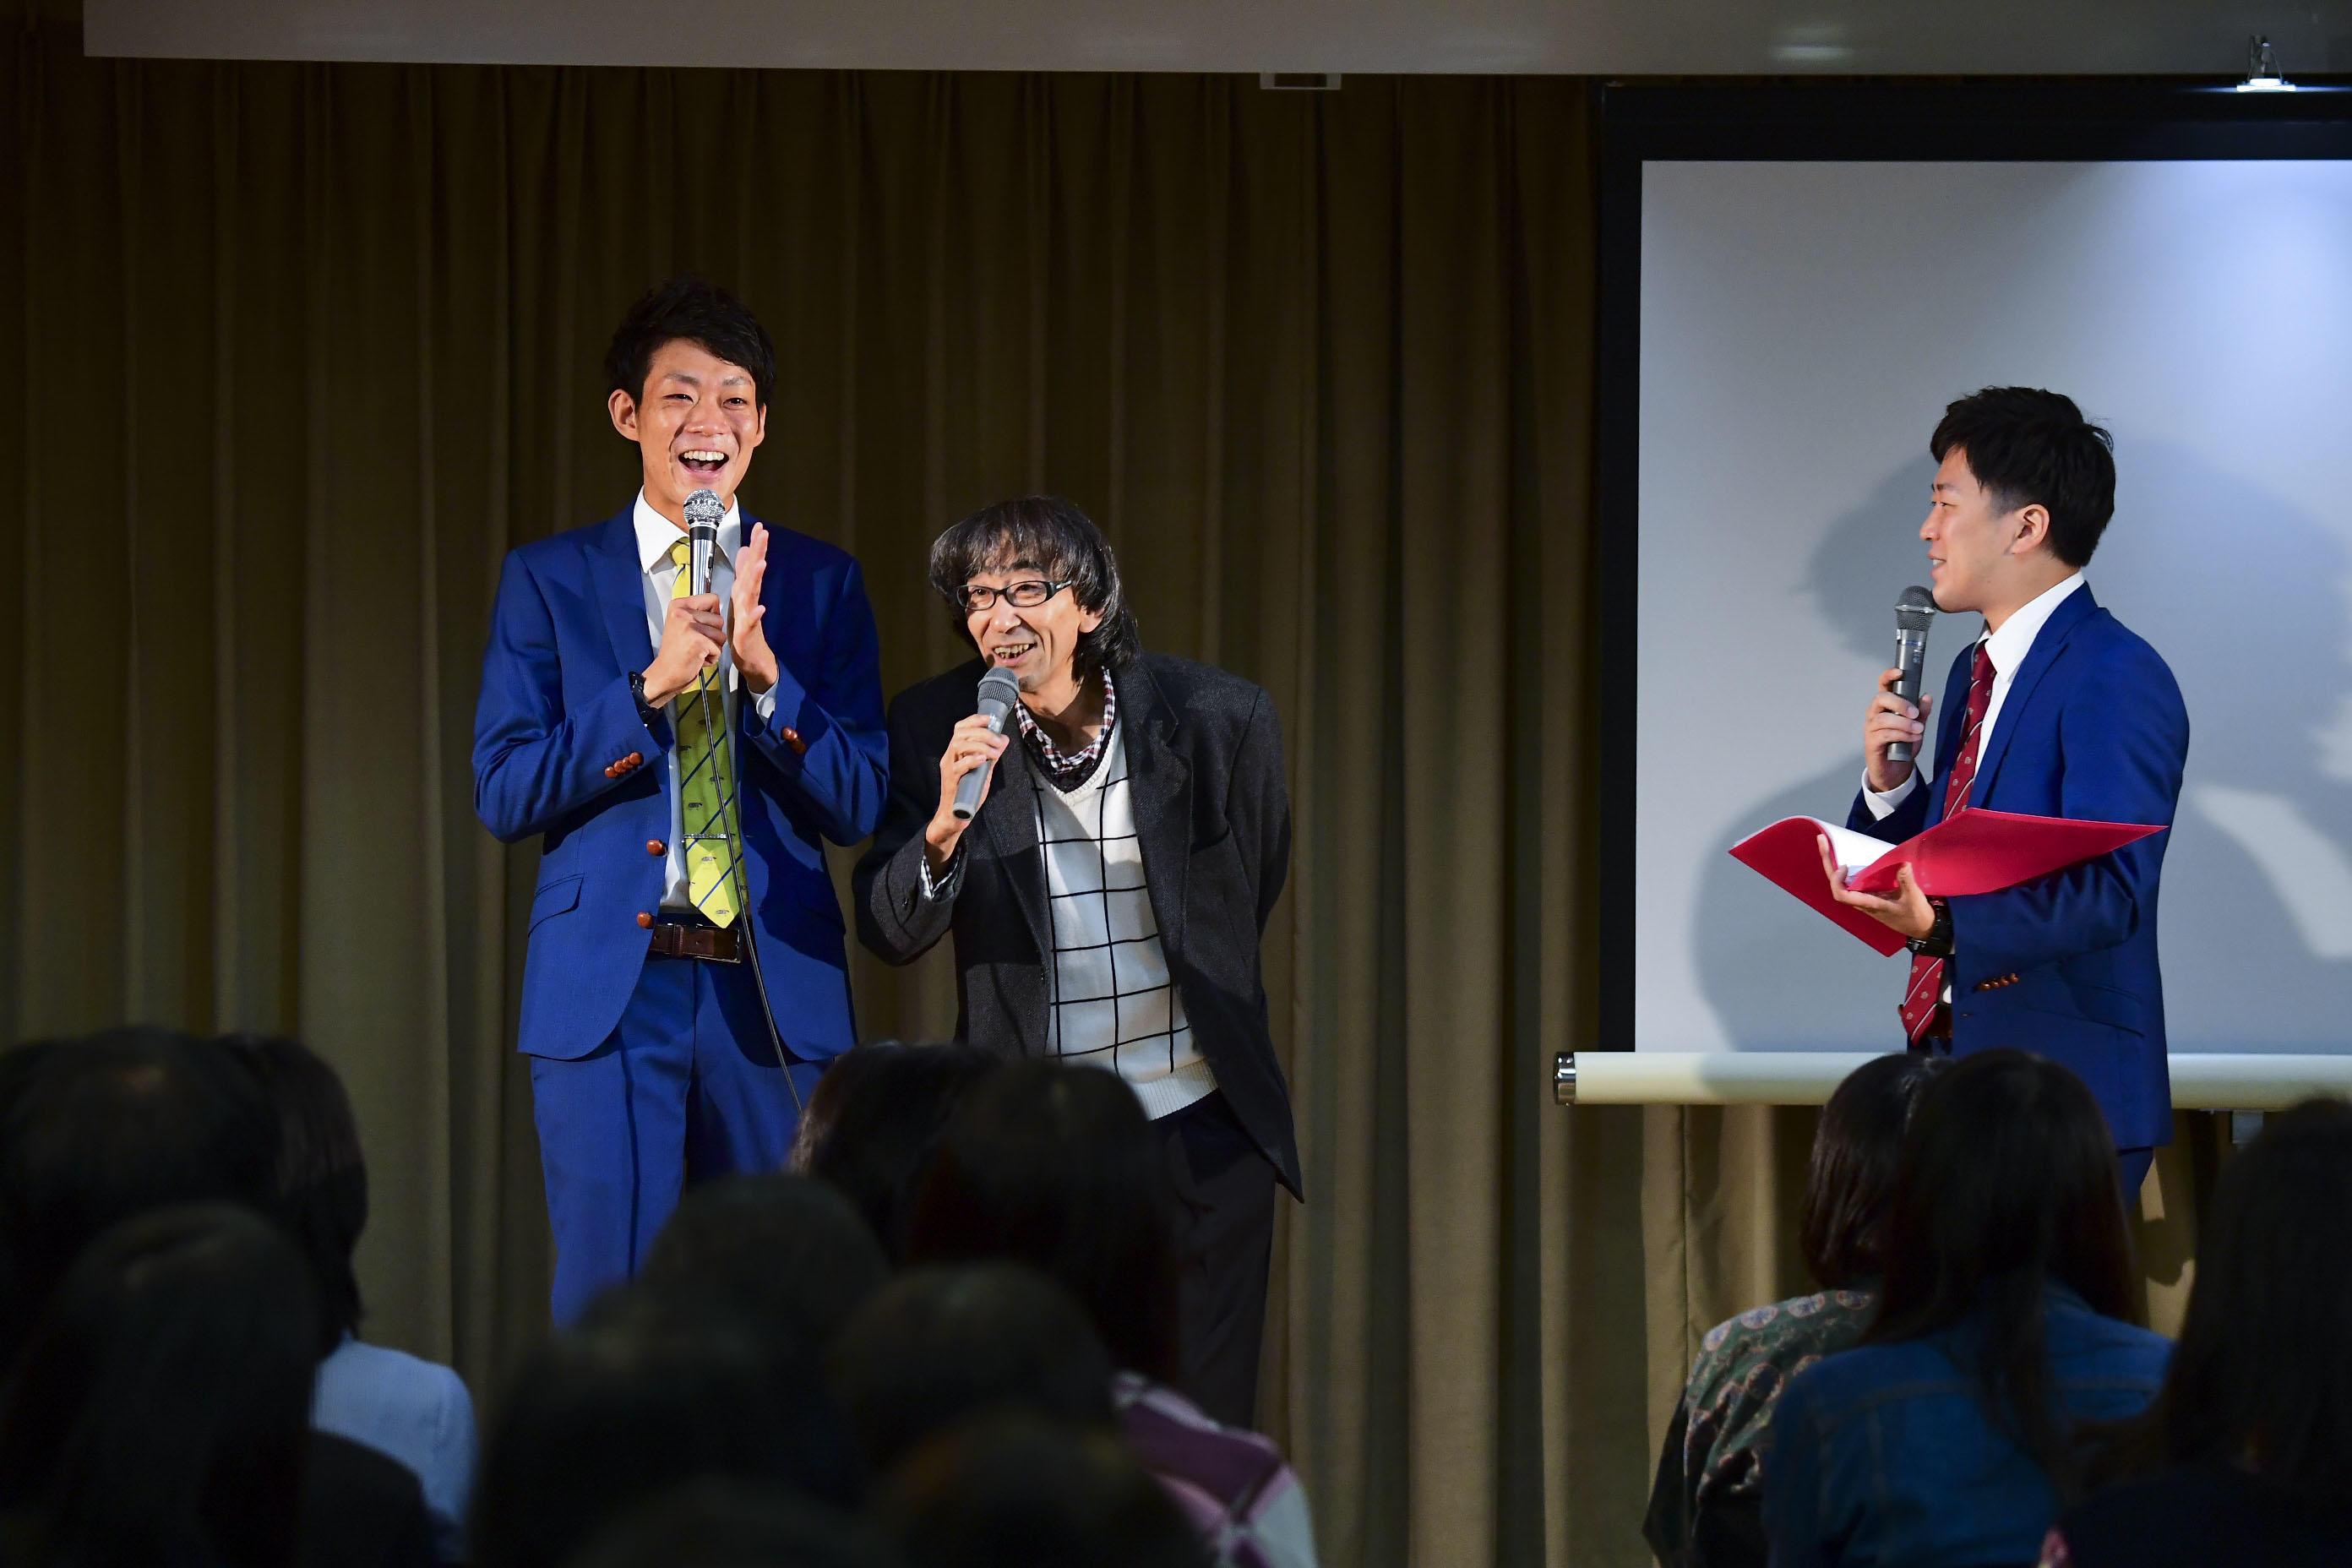 http://news.yoshimoto.co.jp/20171009101731-16f1fda00bd290d7d1e7dd1fe2cea199a8aa1c76.jpg